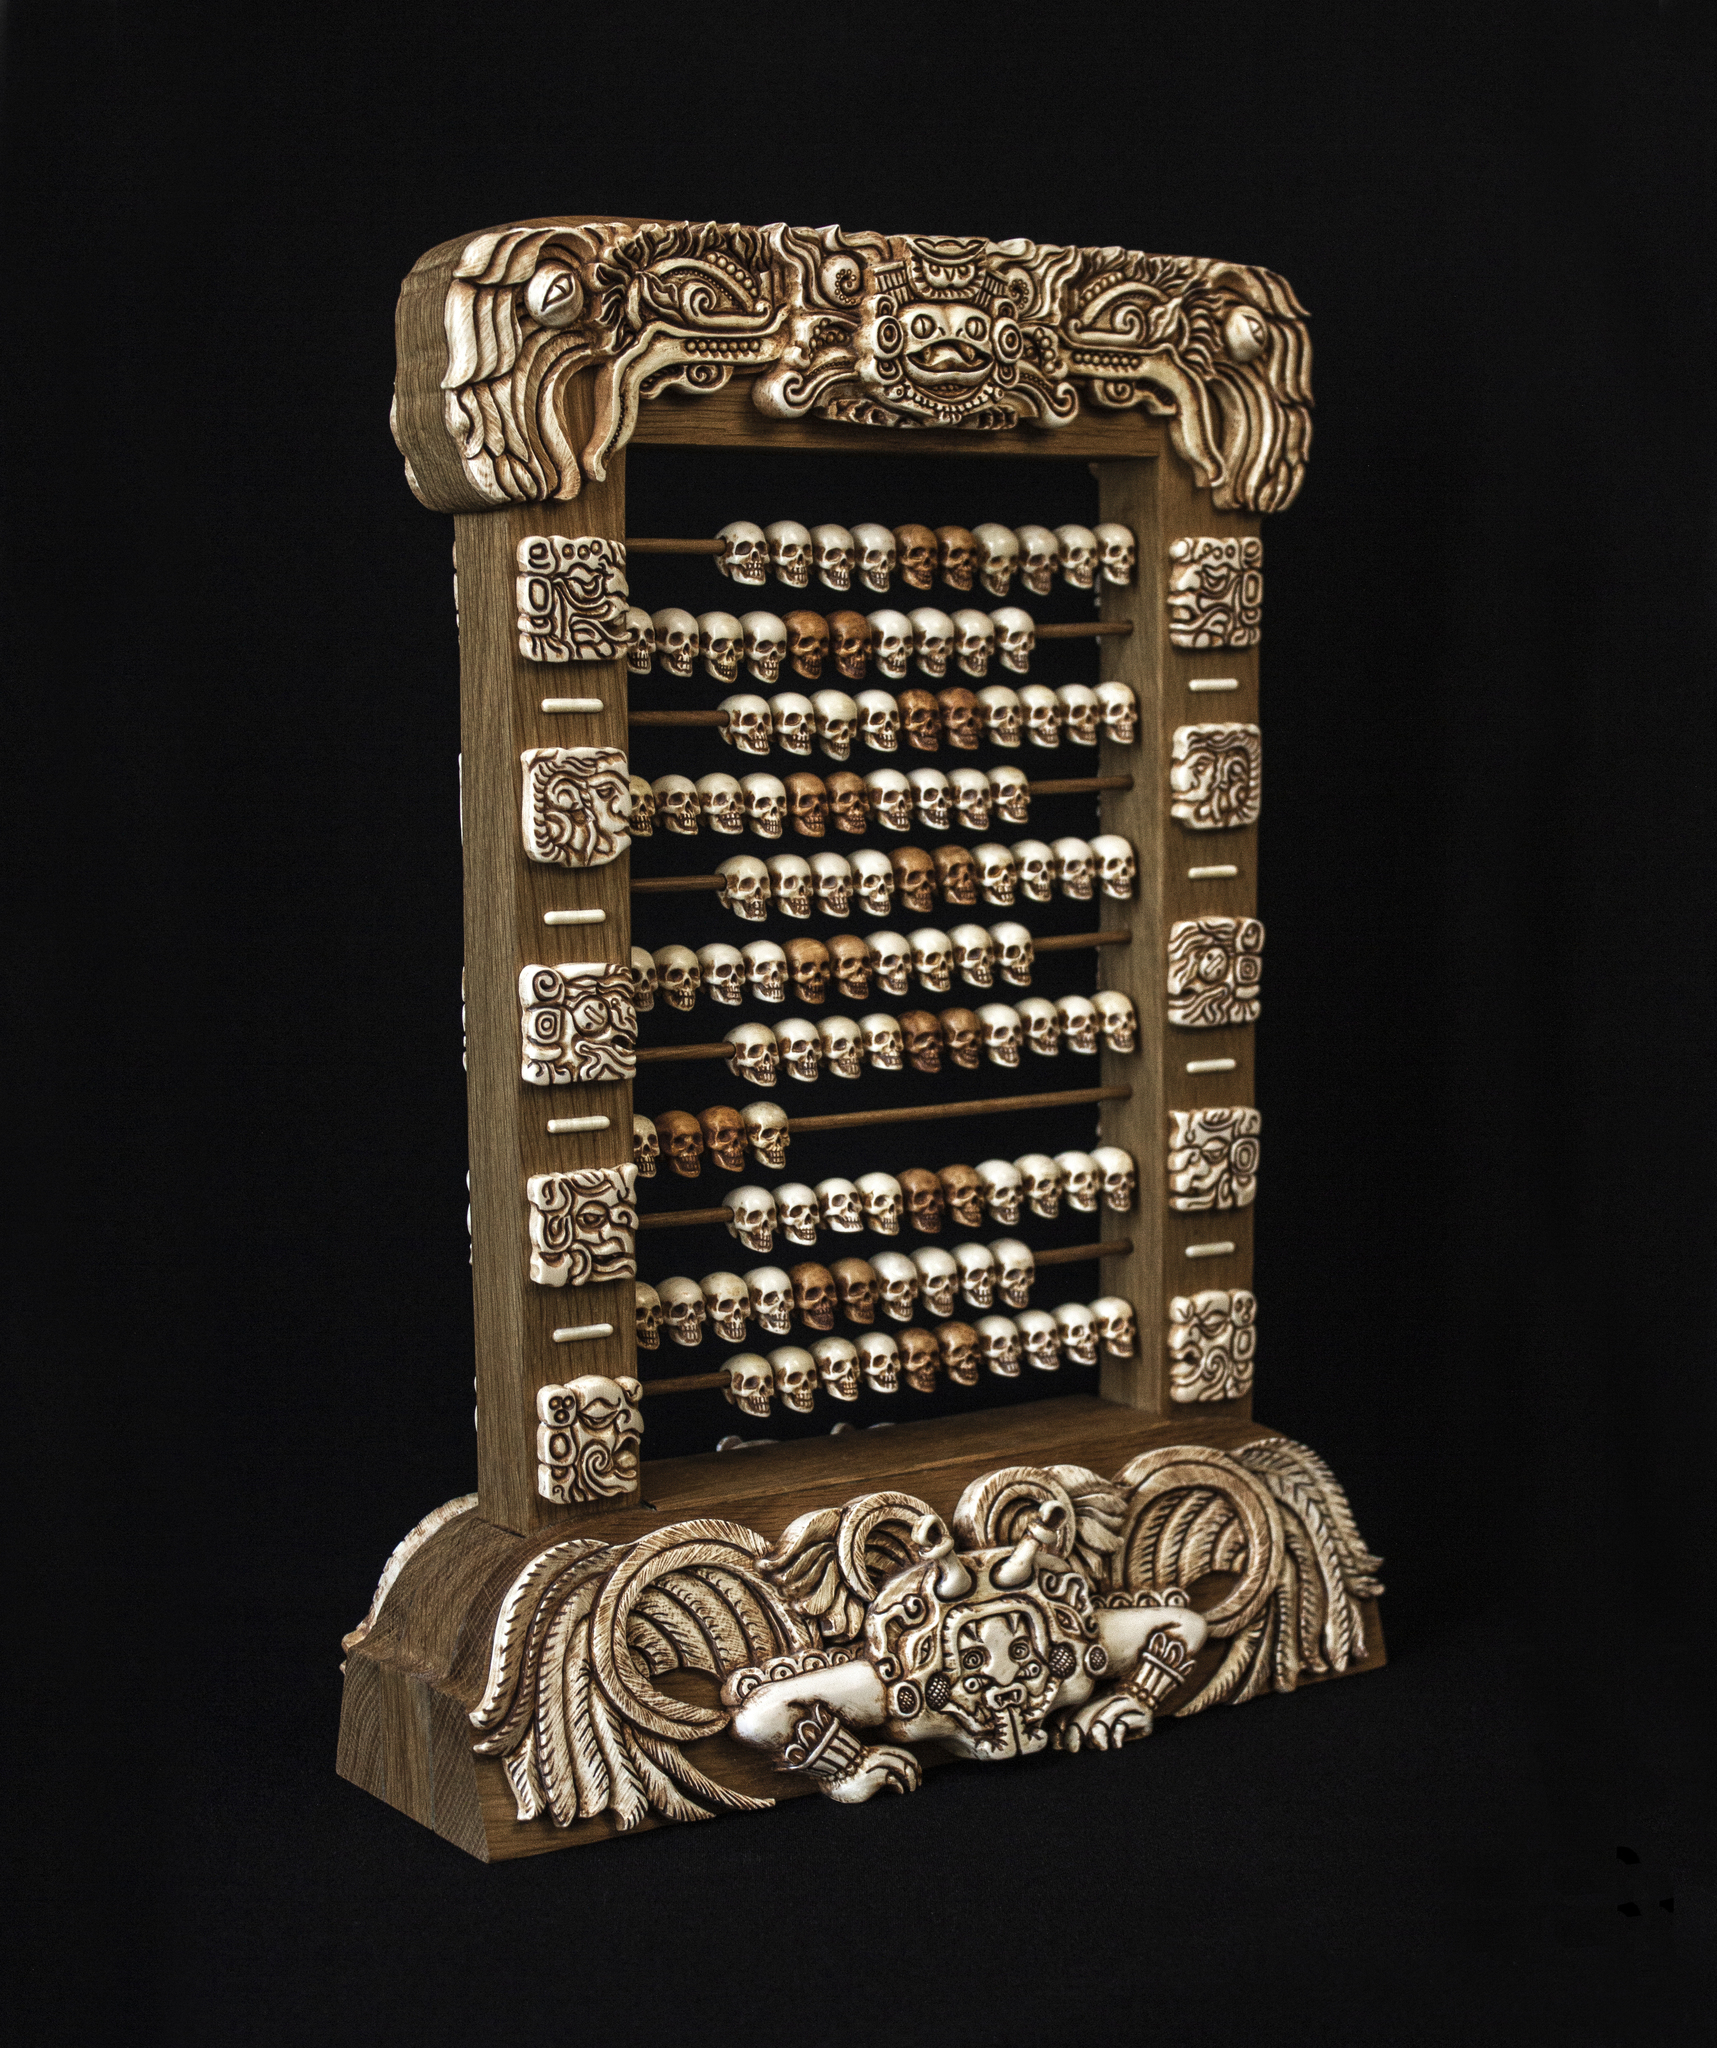 Ритуальная счётная машина Александра фон Гумбольда | Эксклюзив